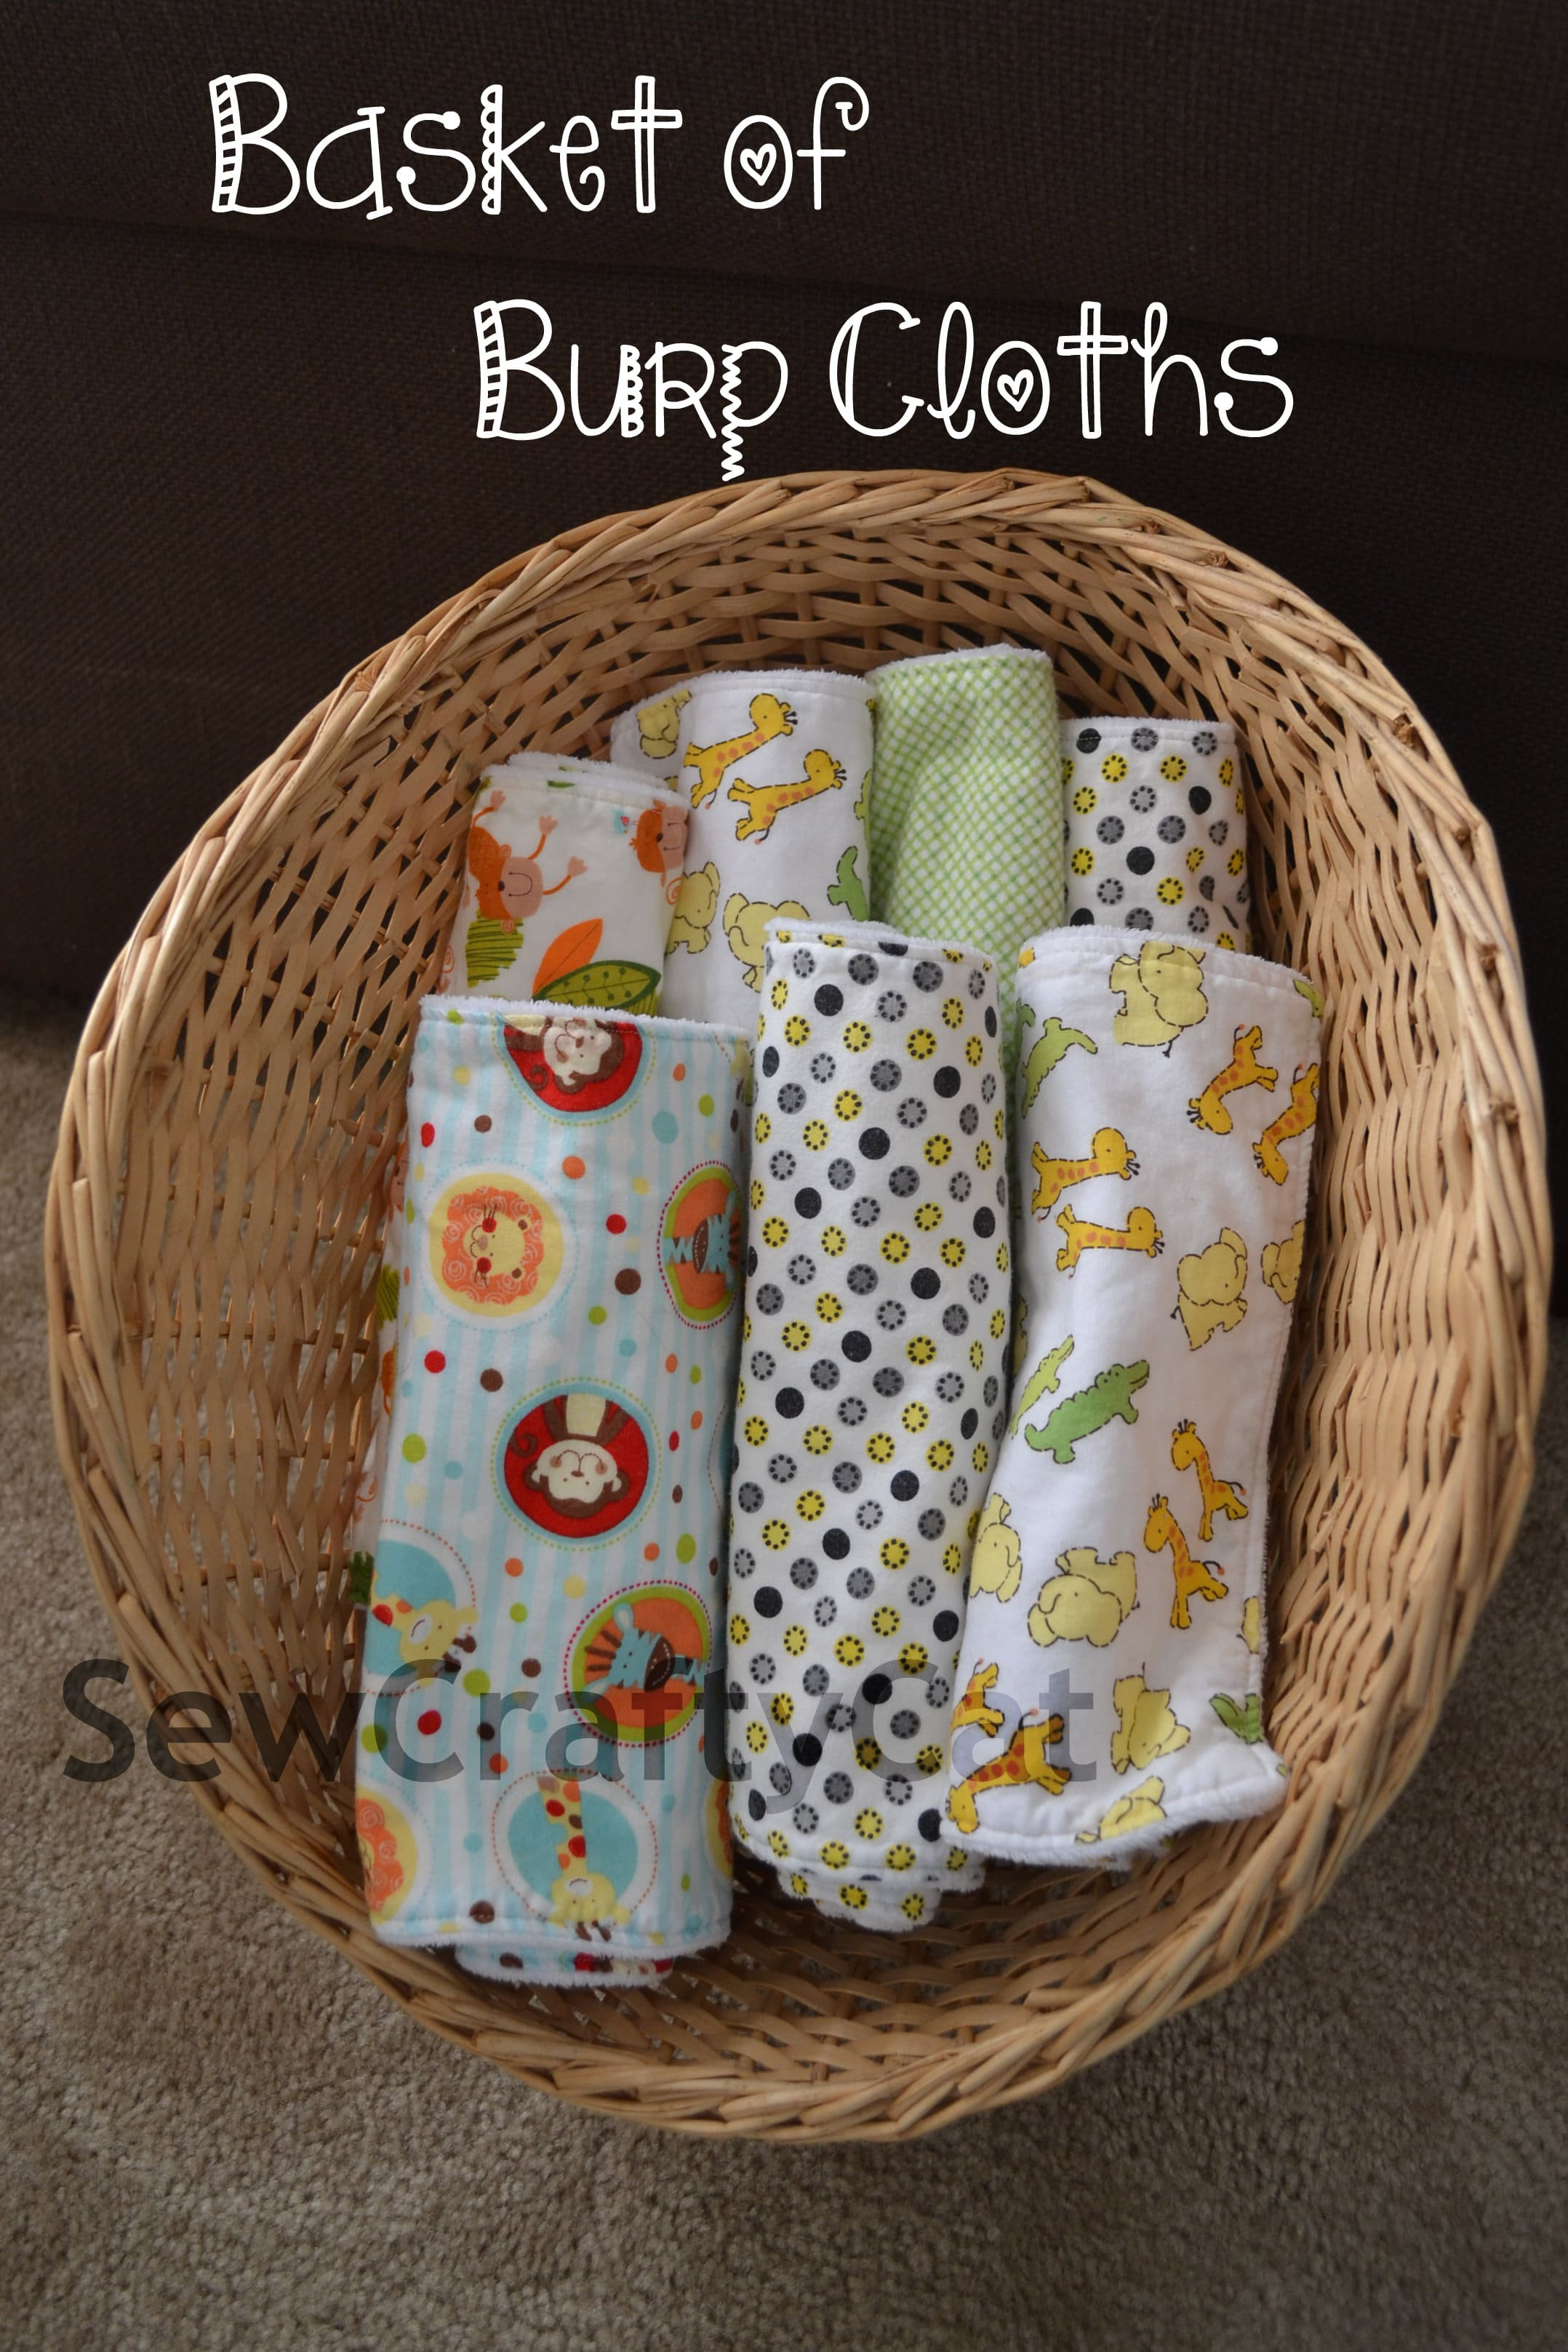 Basket of Burp Cloths